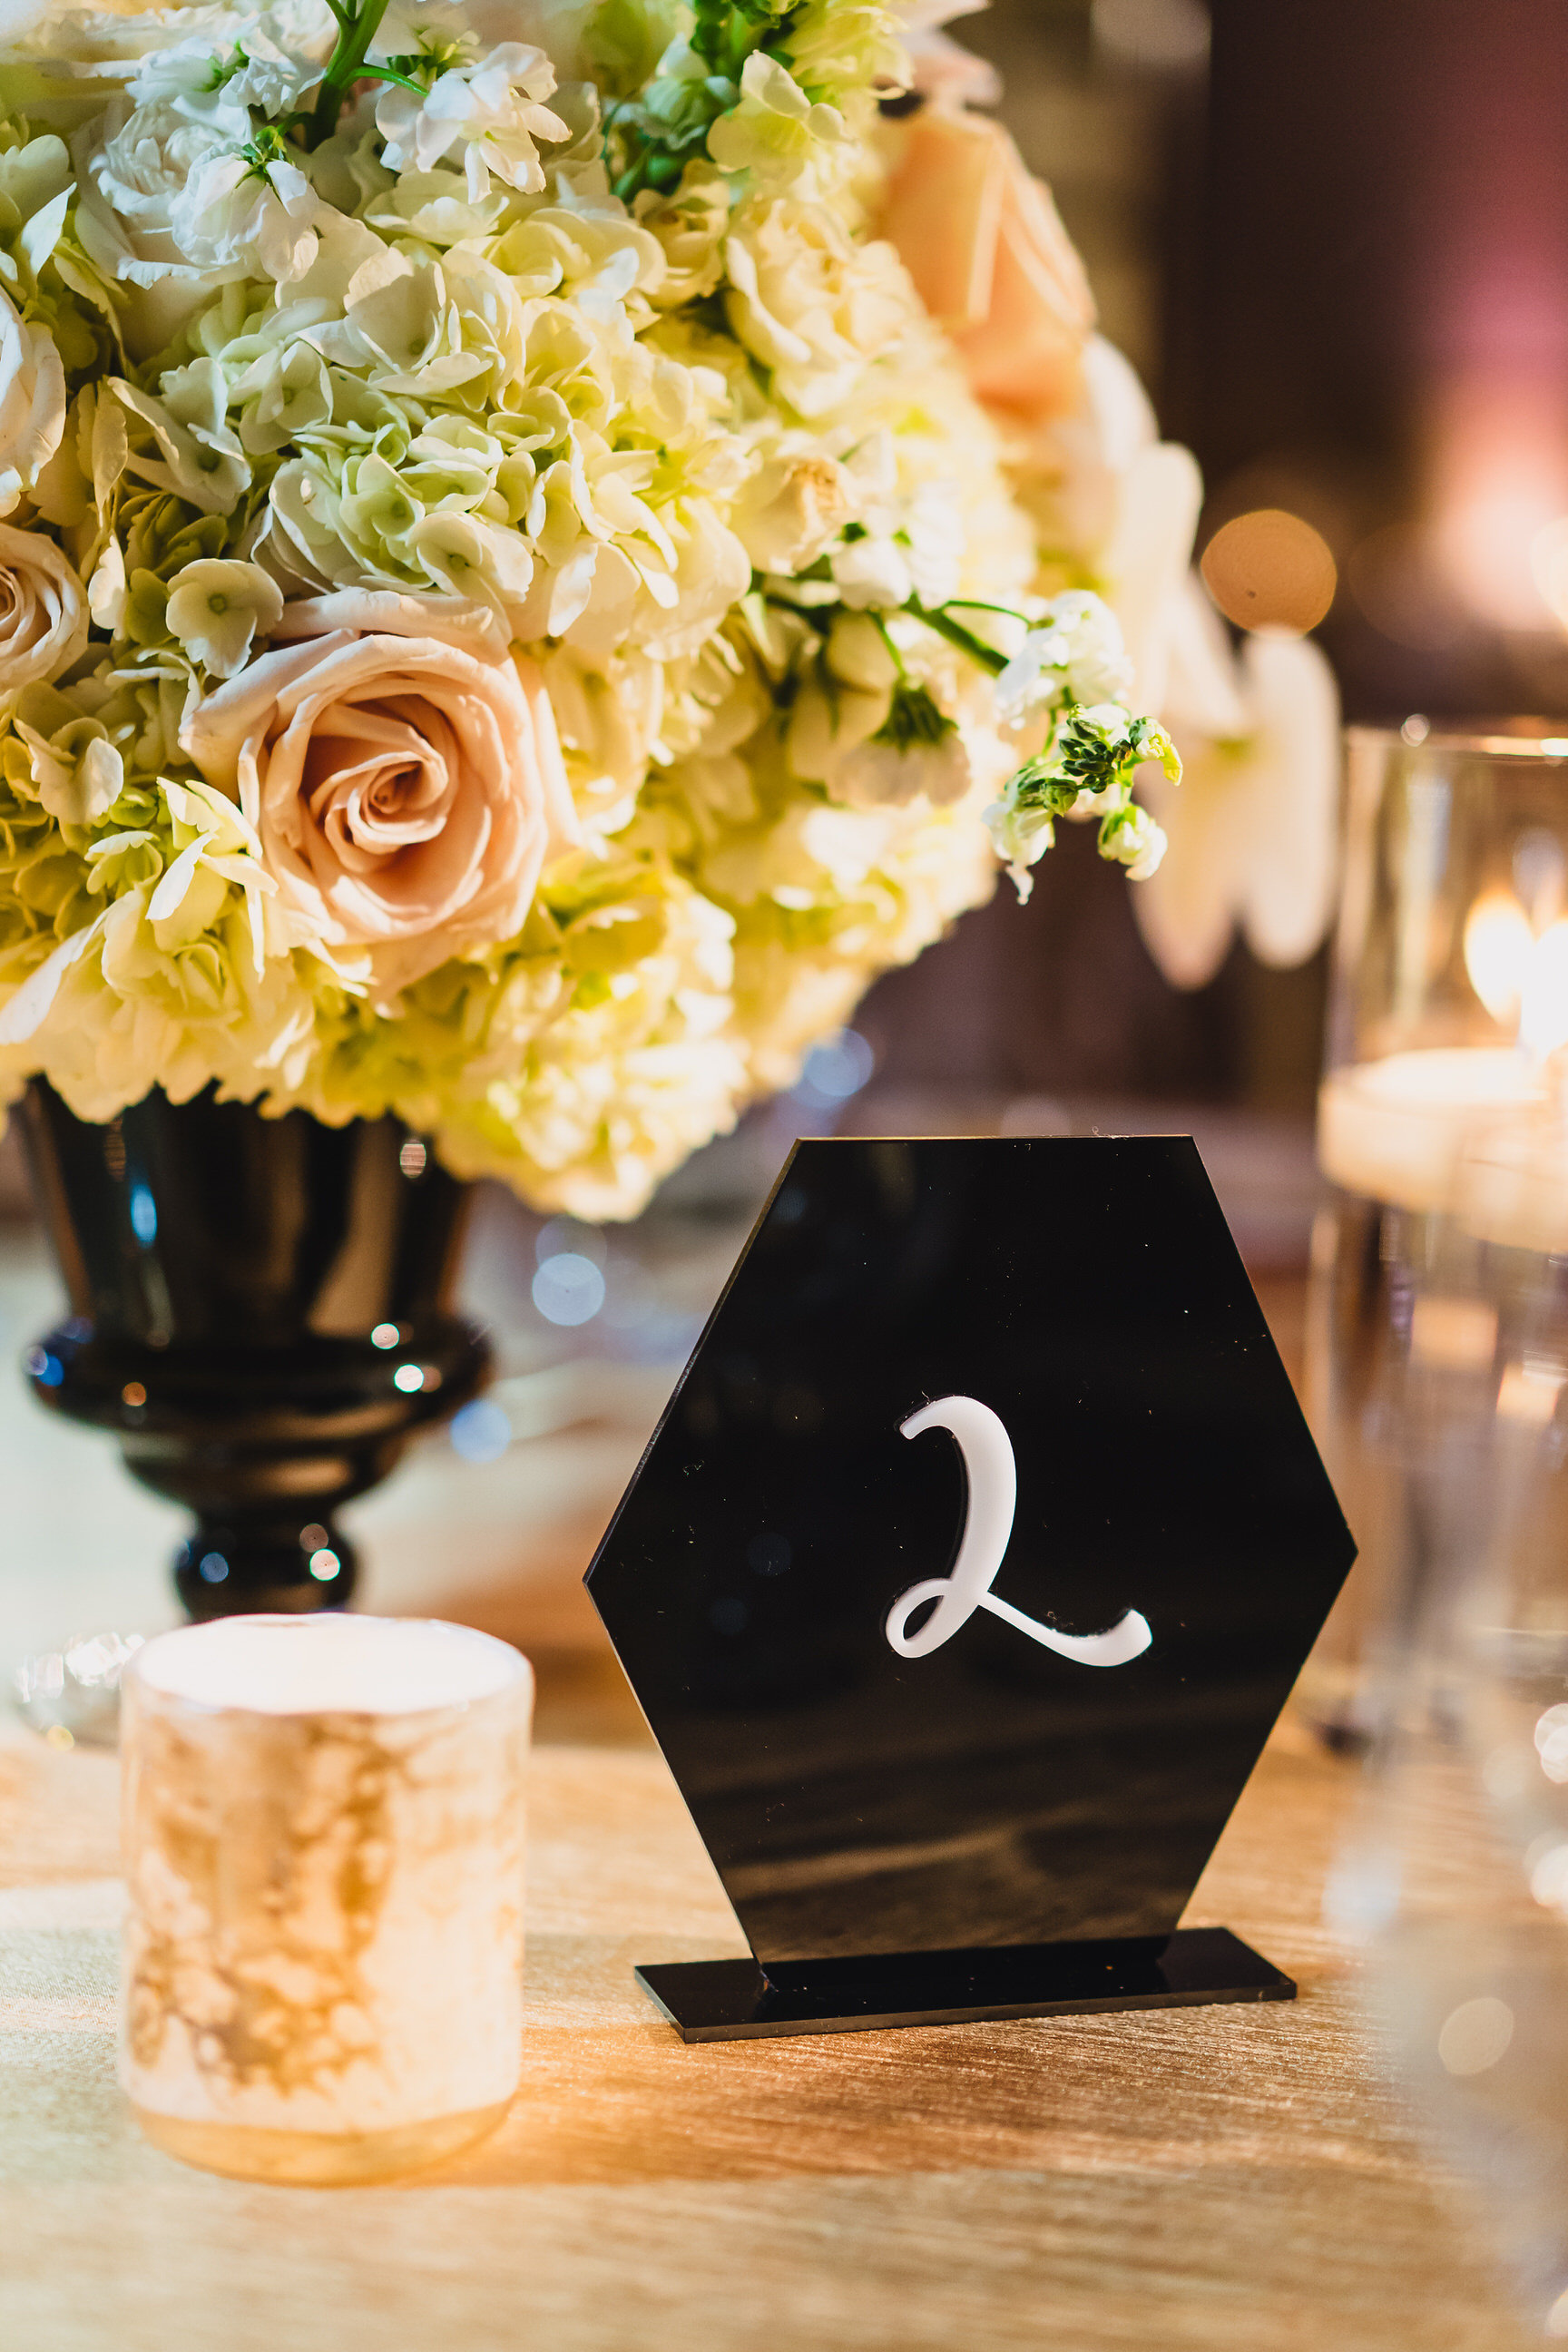 INDIAN WEDDING TABLE SETTING DECOR.JPG